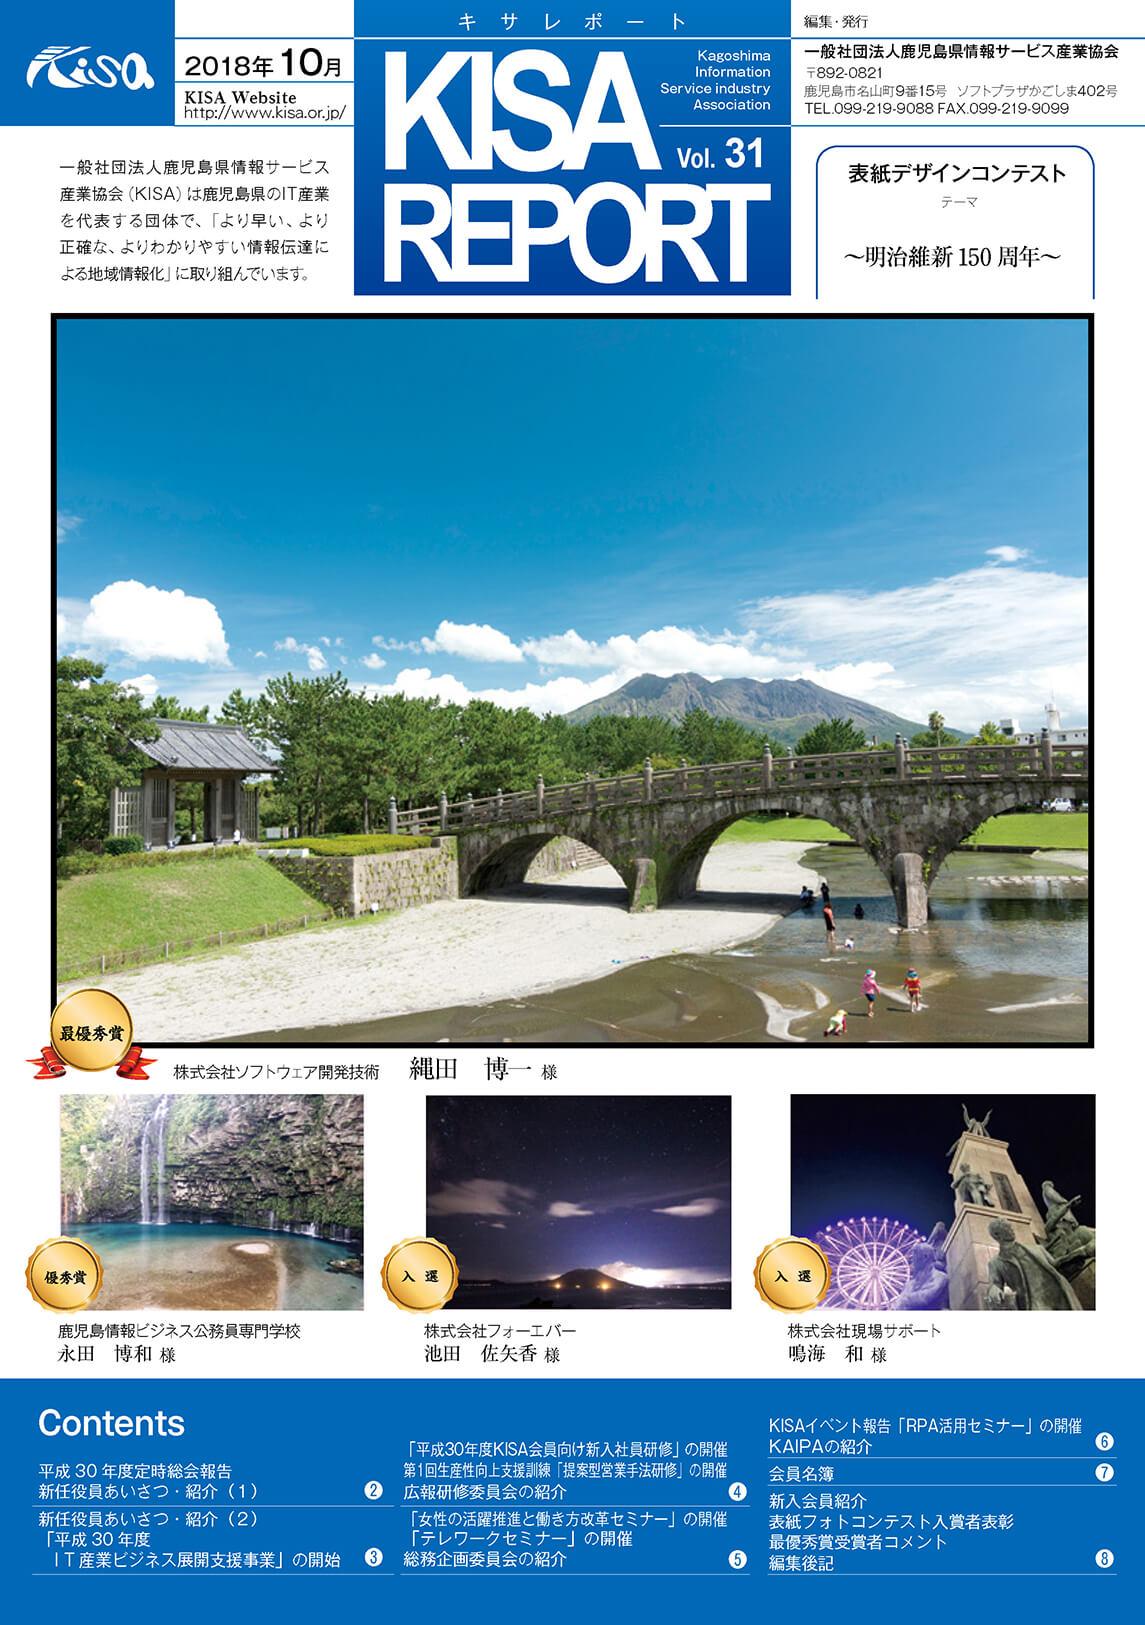 『KISA REPORT Vol.31』発刊しました